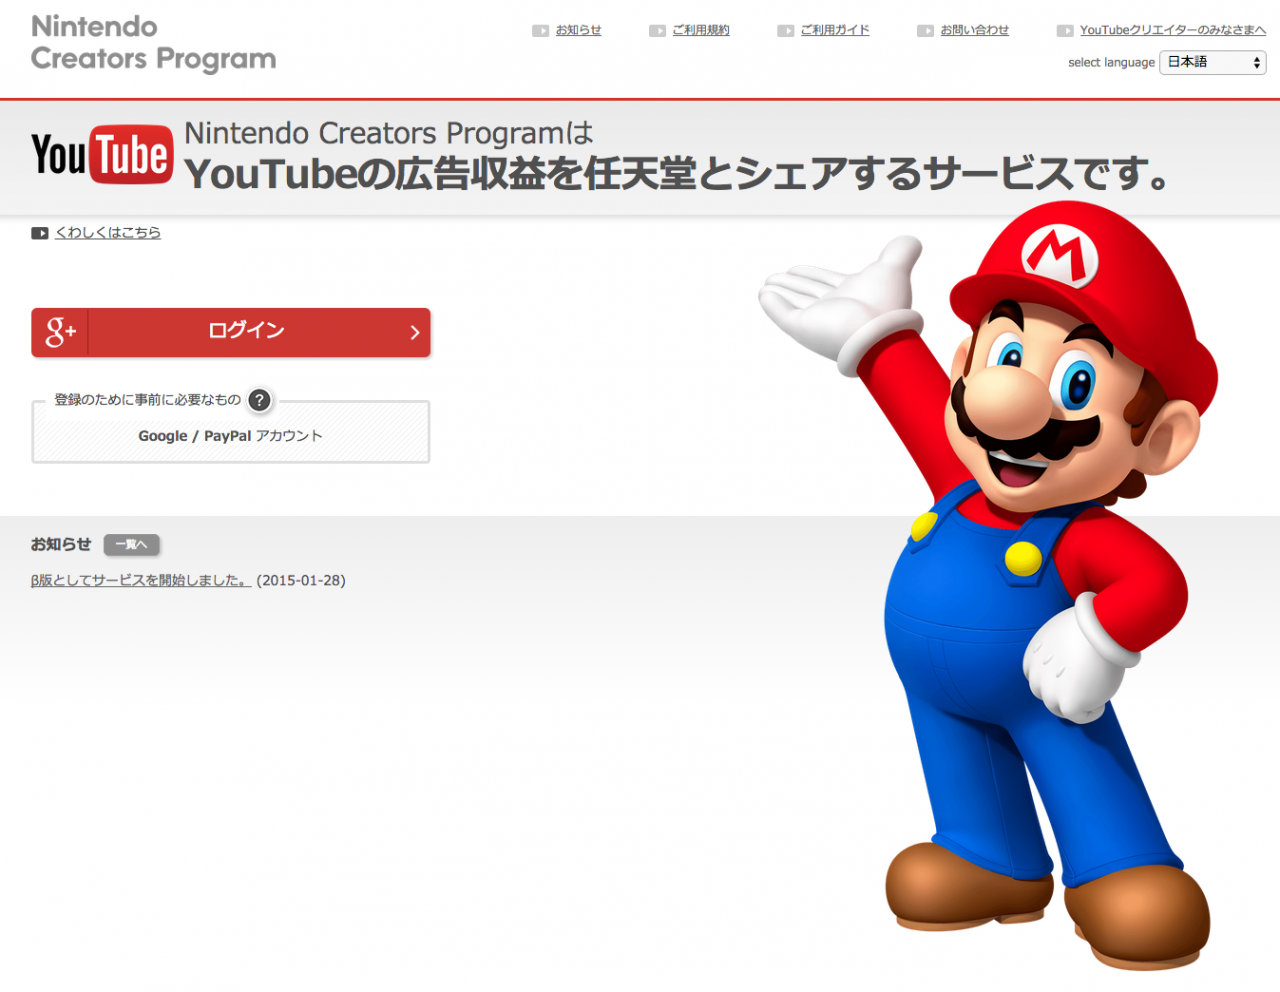 Nintendo_Creators_Program